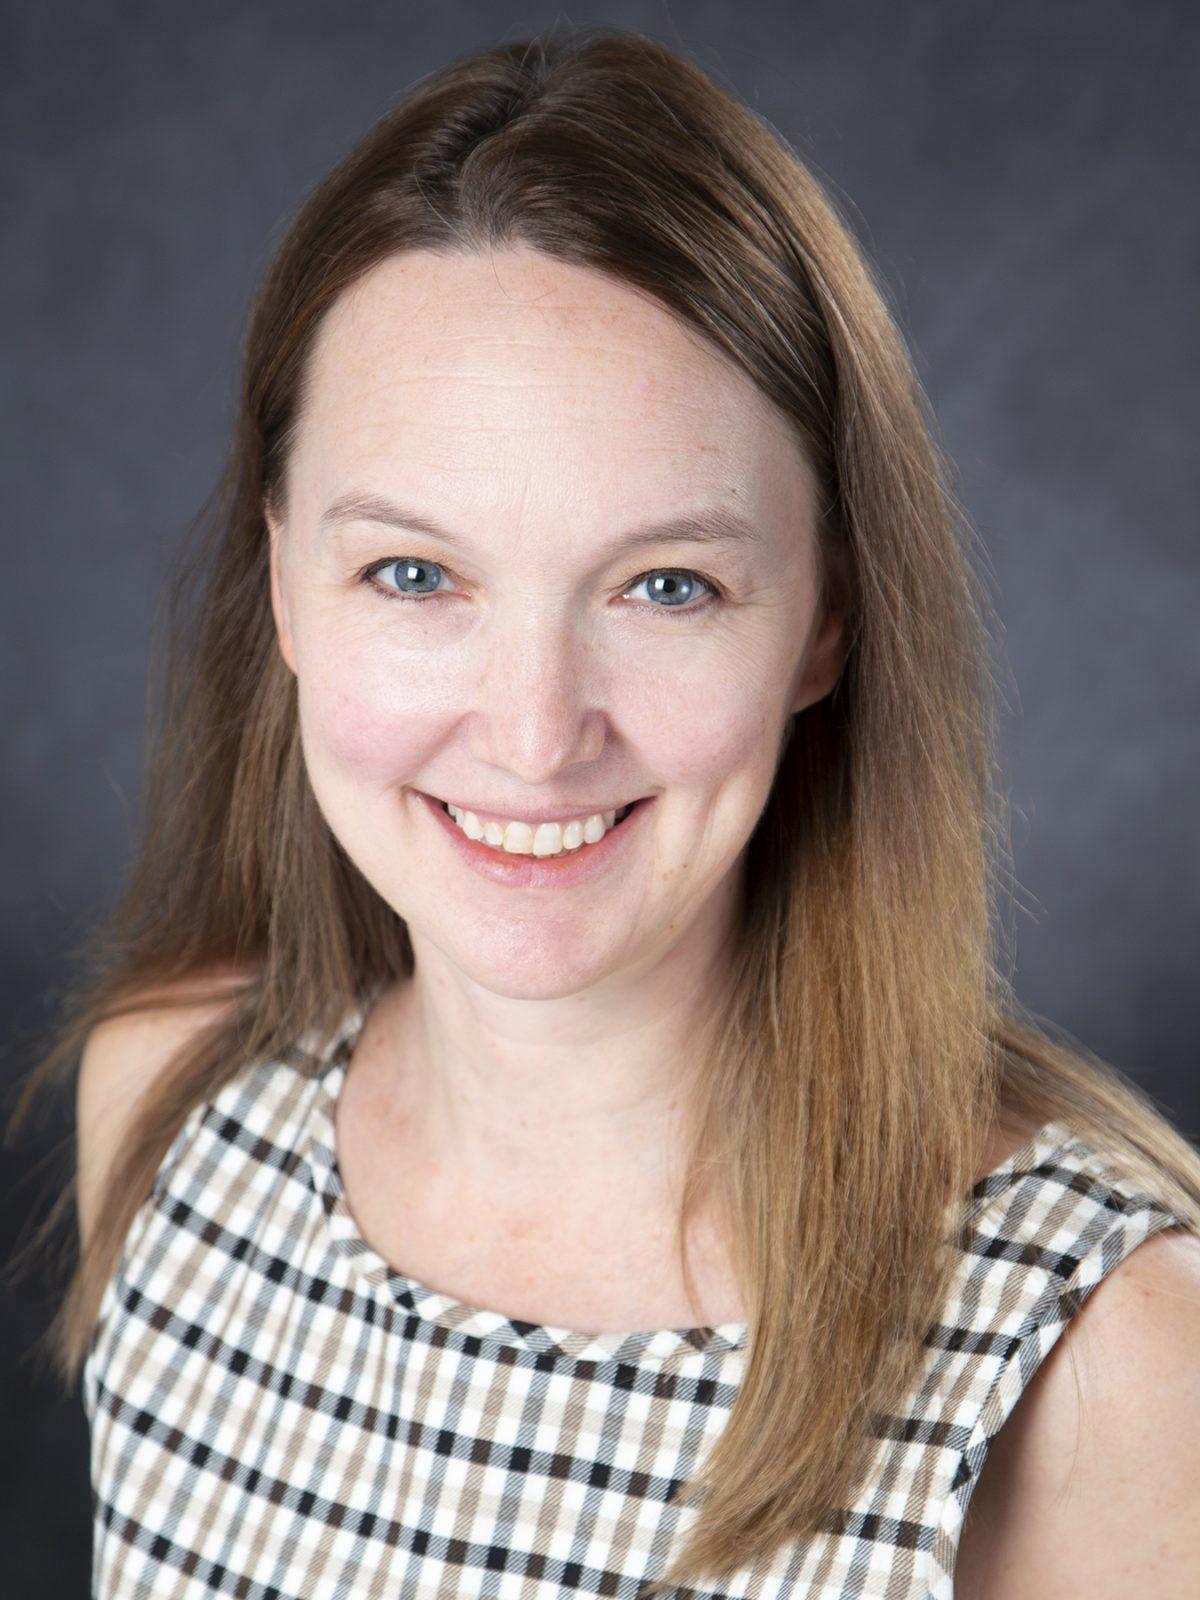 Elisabeth Erekson, MD, MPH, FACOG, FACS